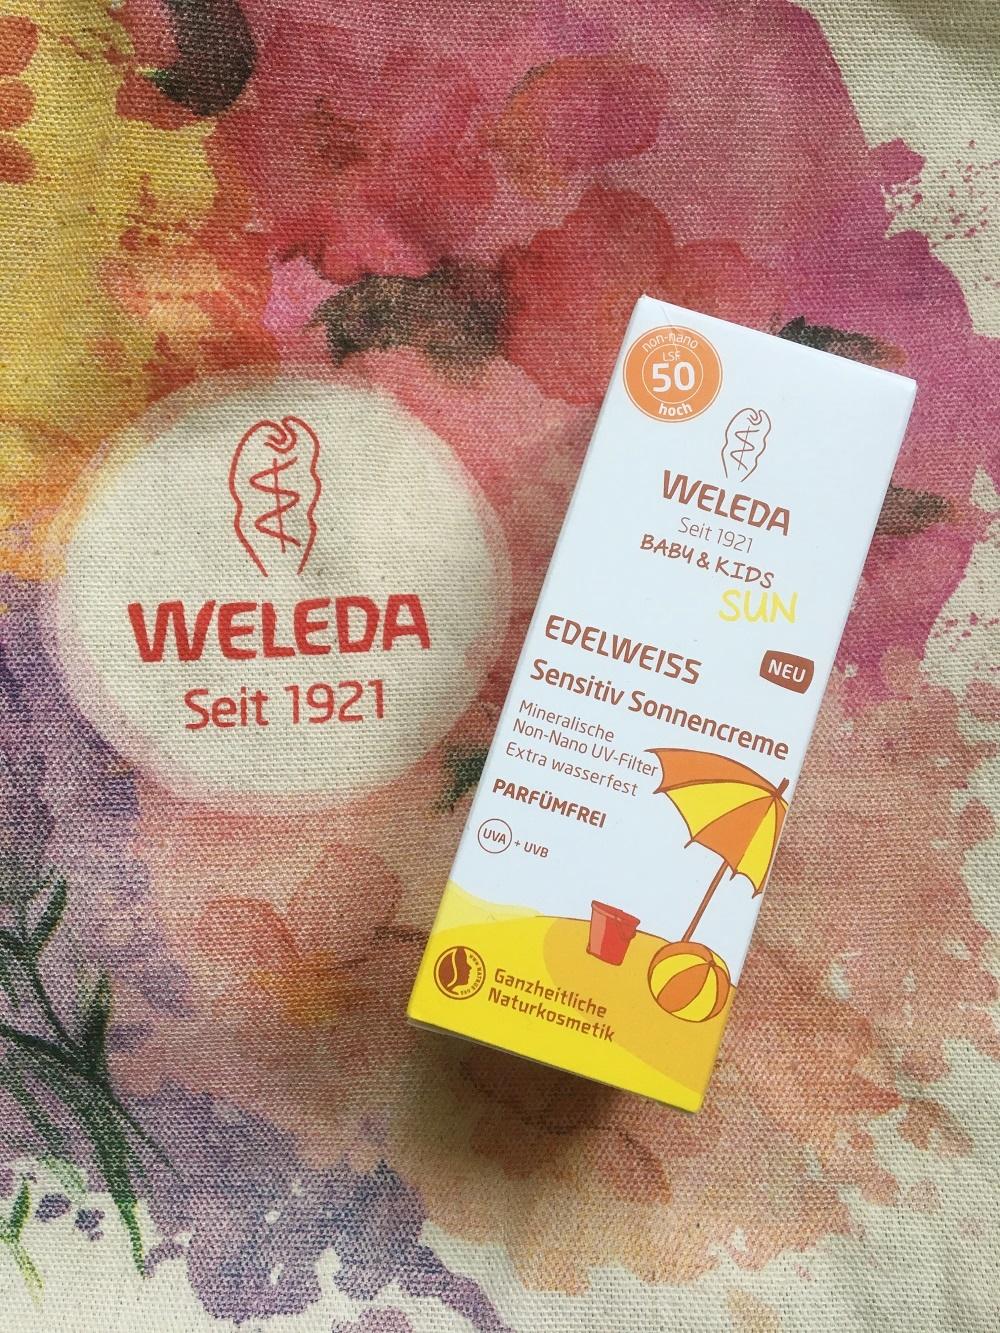 Weleda Edelweiss Sonnencreme Verpackung auf Weleda Jutebeutel www.sunnyside-of-life.de